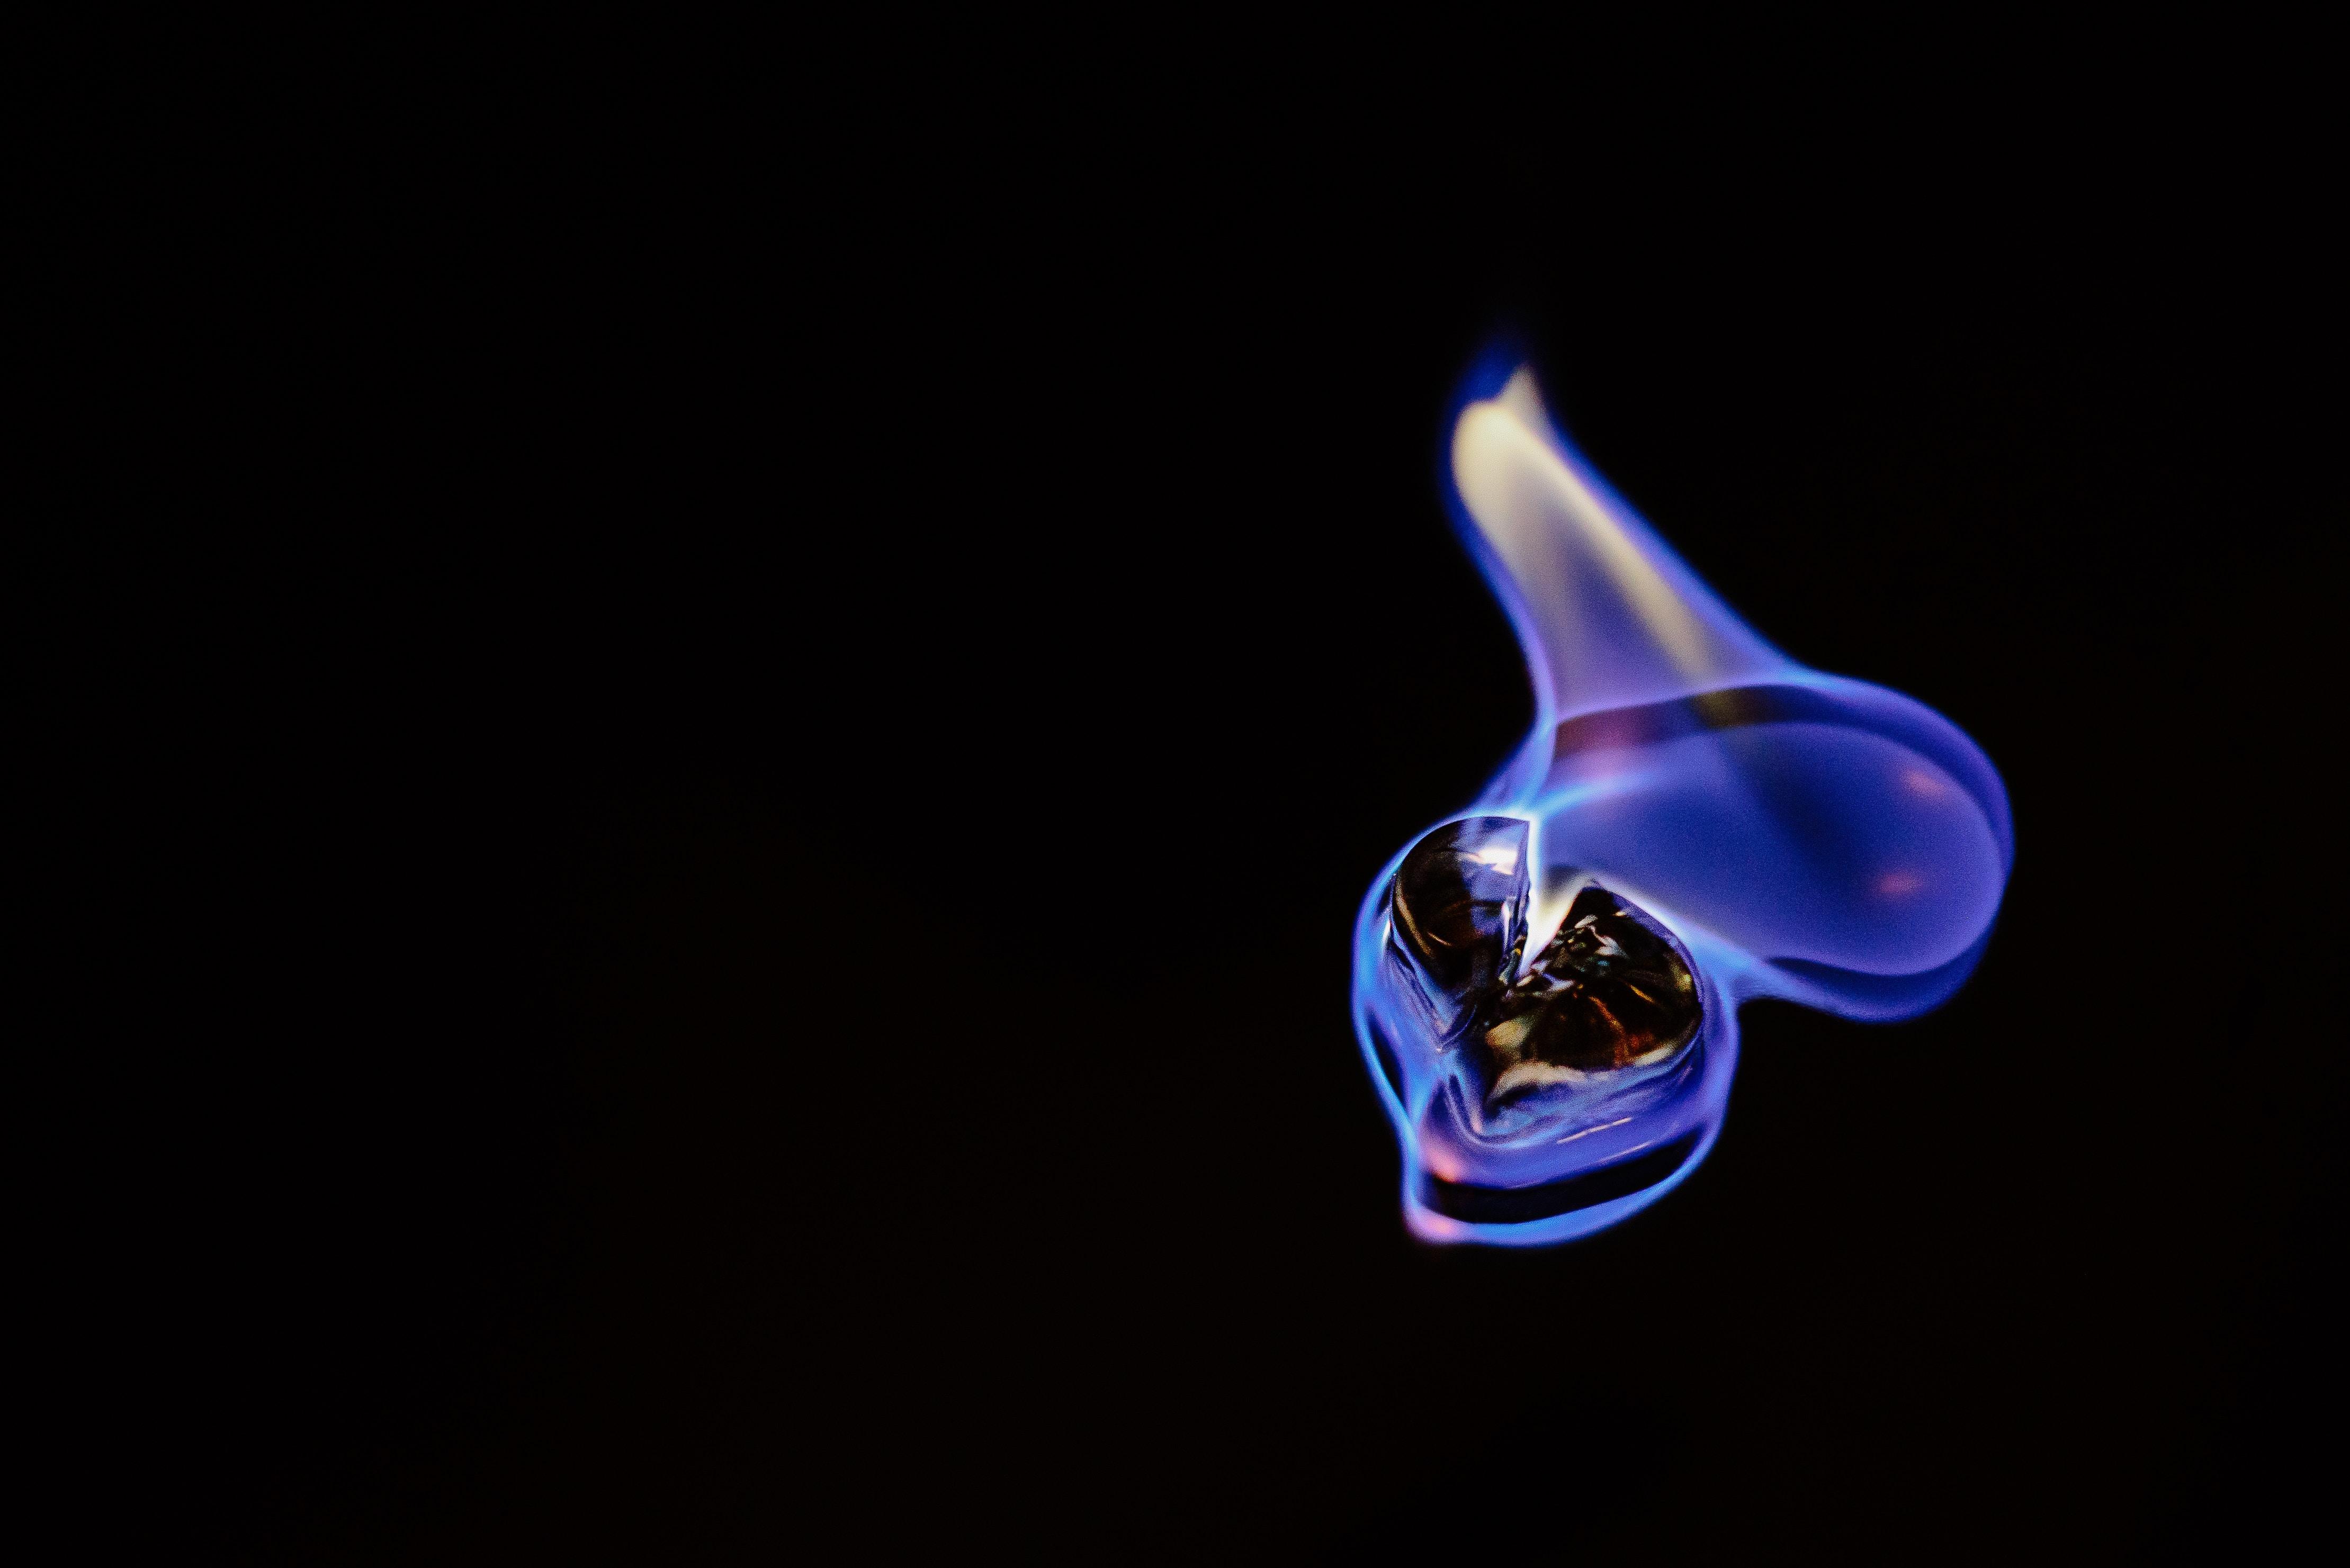 black substance on fire